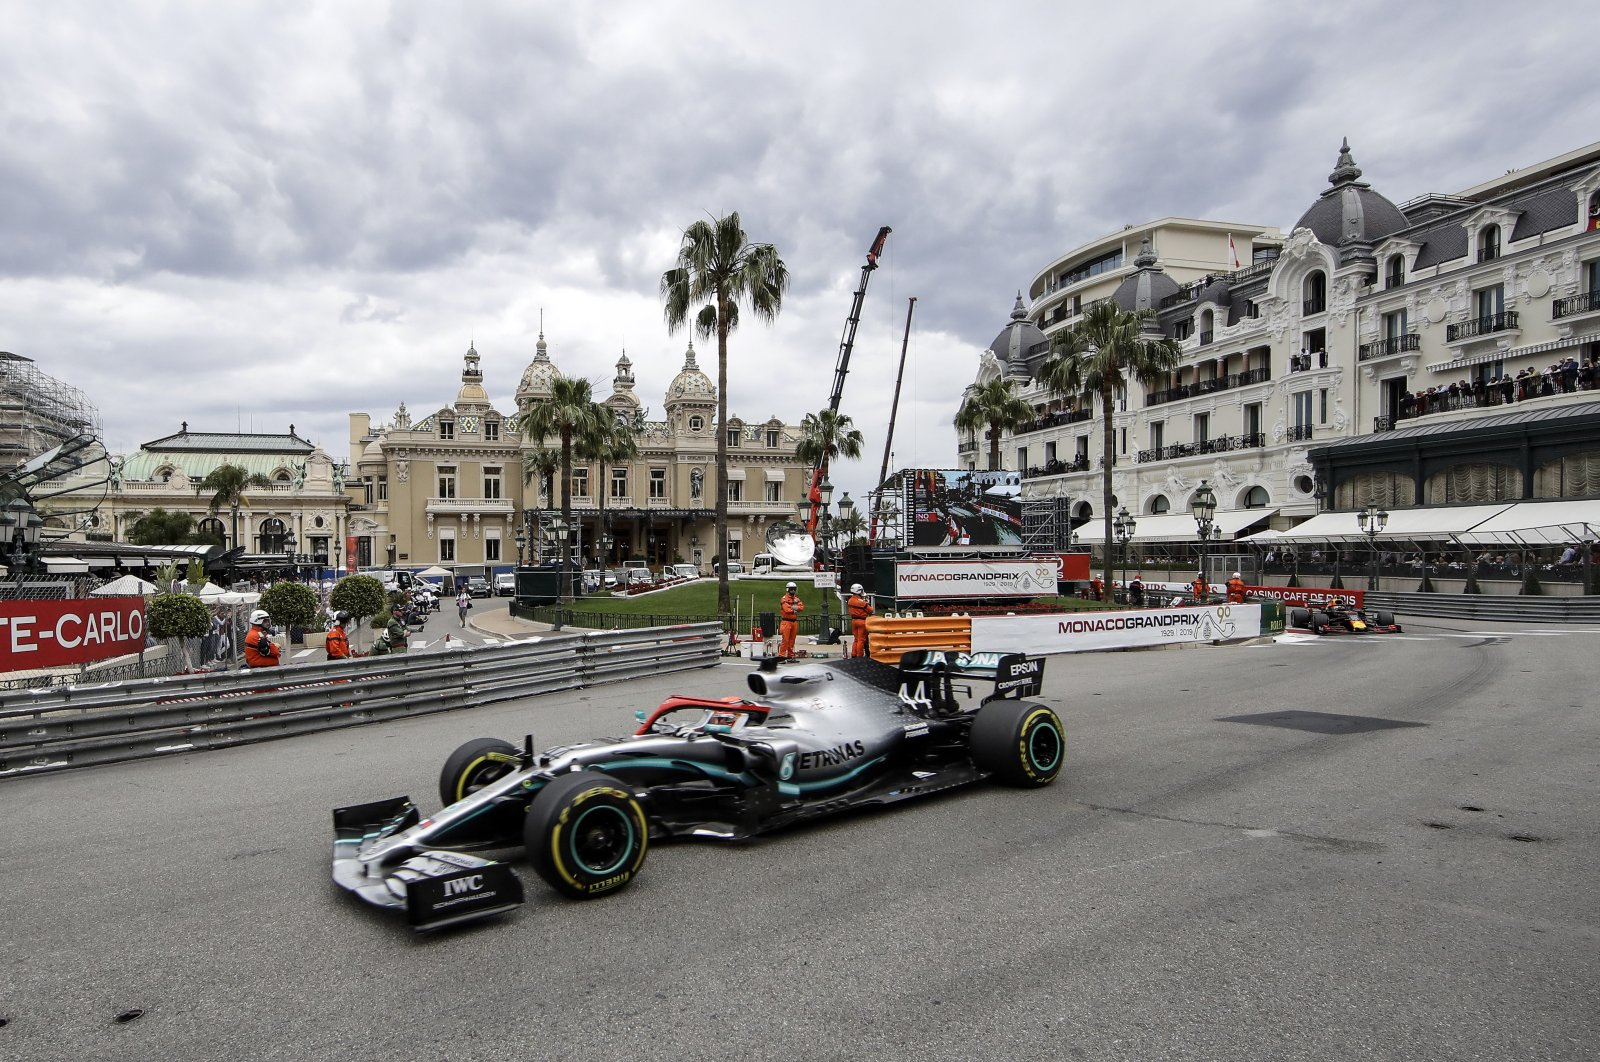 Mercedes' Lewis Hamilton steers his car during the Monaco Grand Prix race, in Monaco, May 26, 2019. (AP Photo)